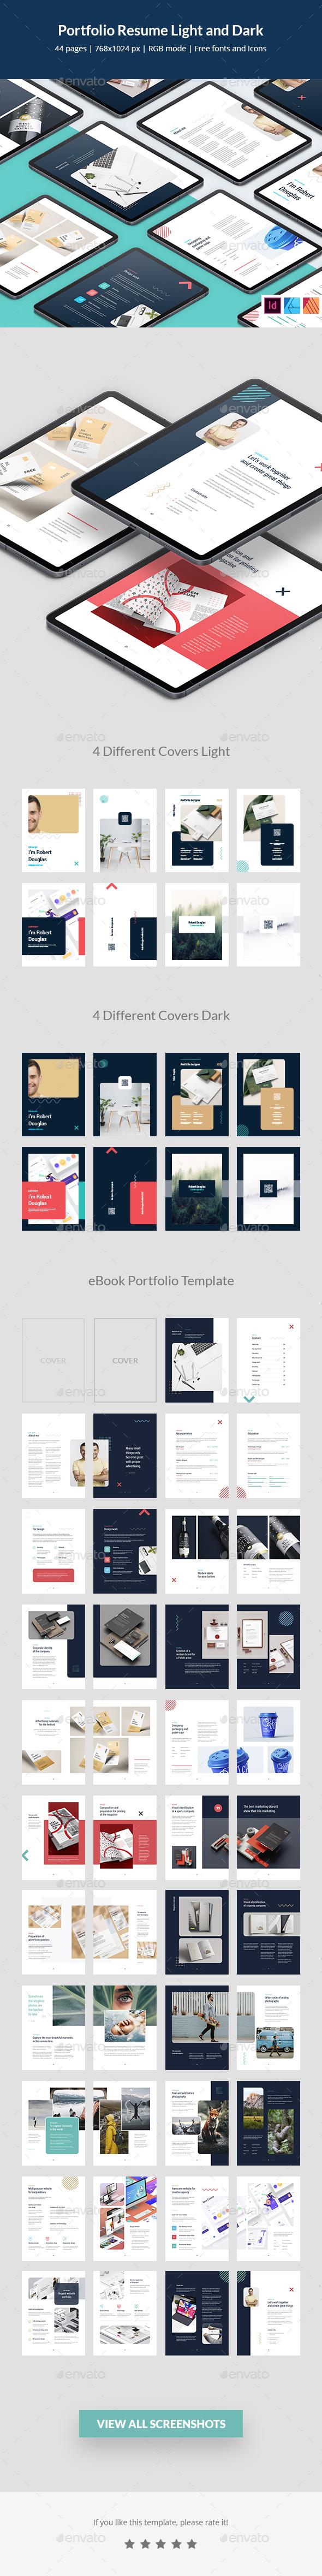 Portfolio Resume Light and Dark eBook